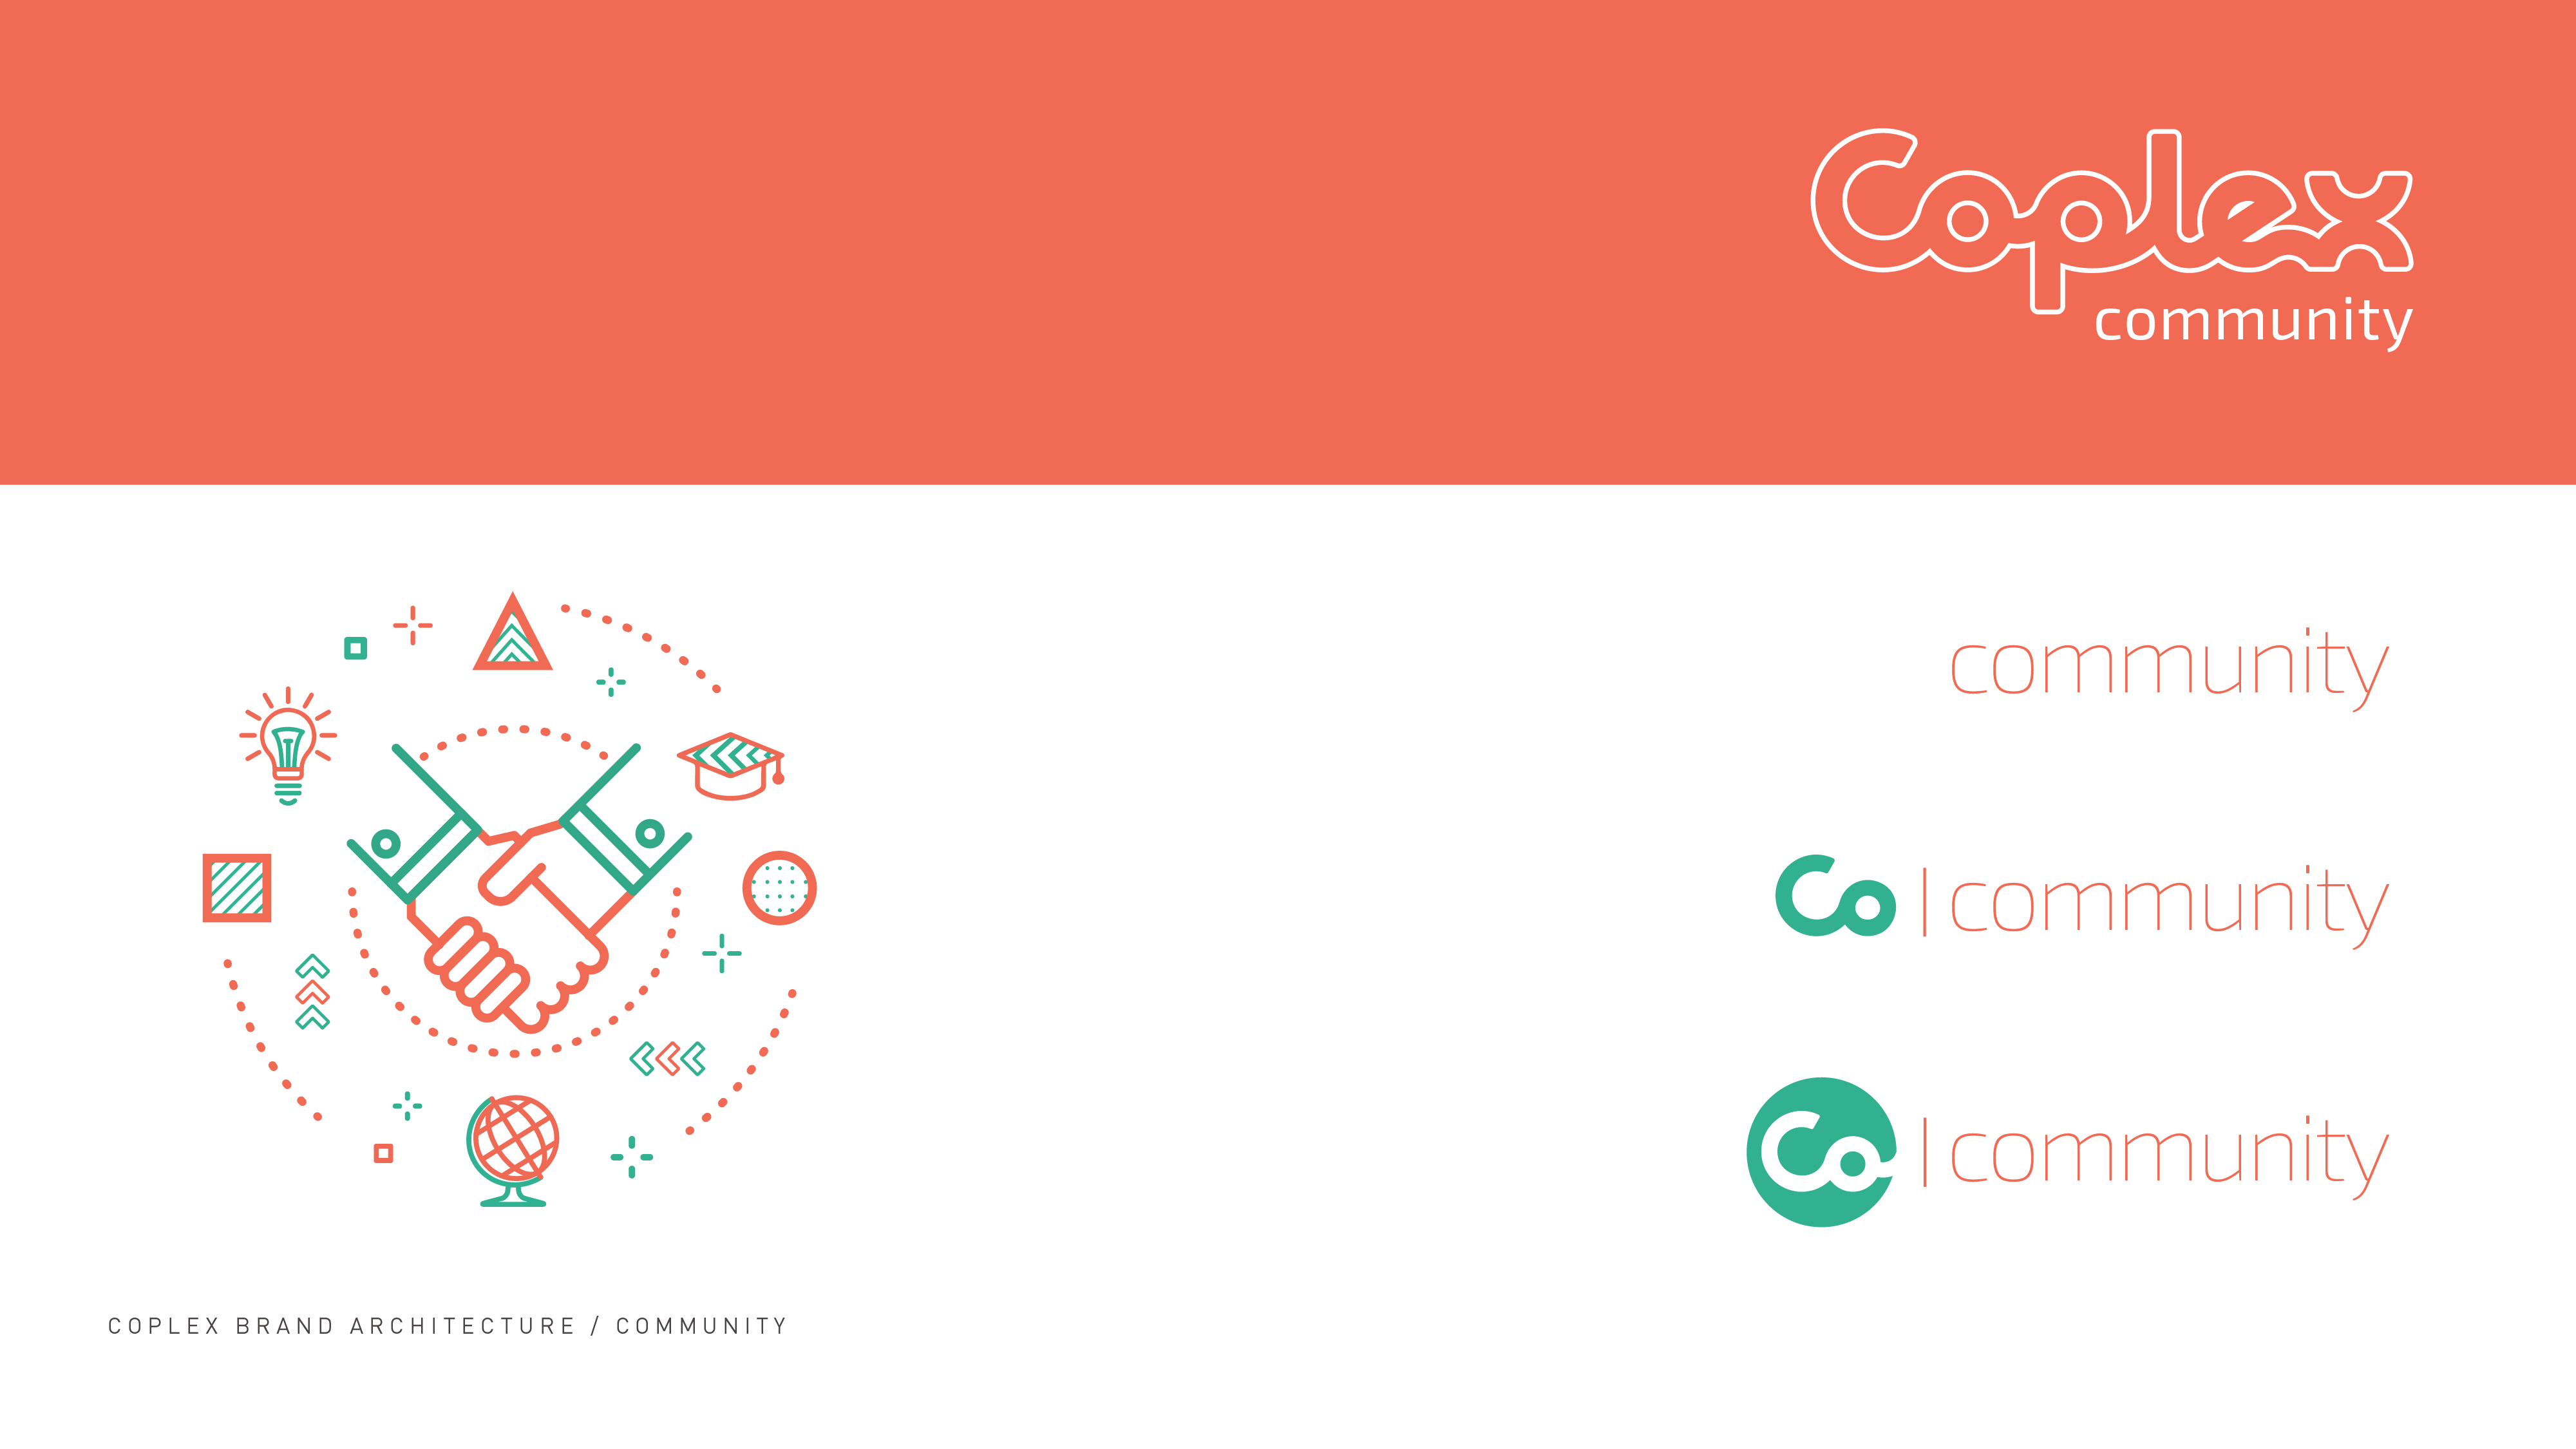 2 coplex brand guide v5 community